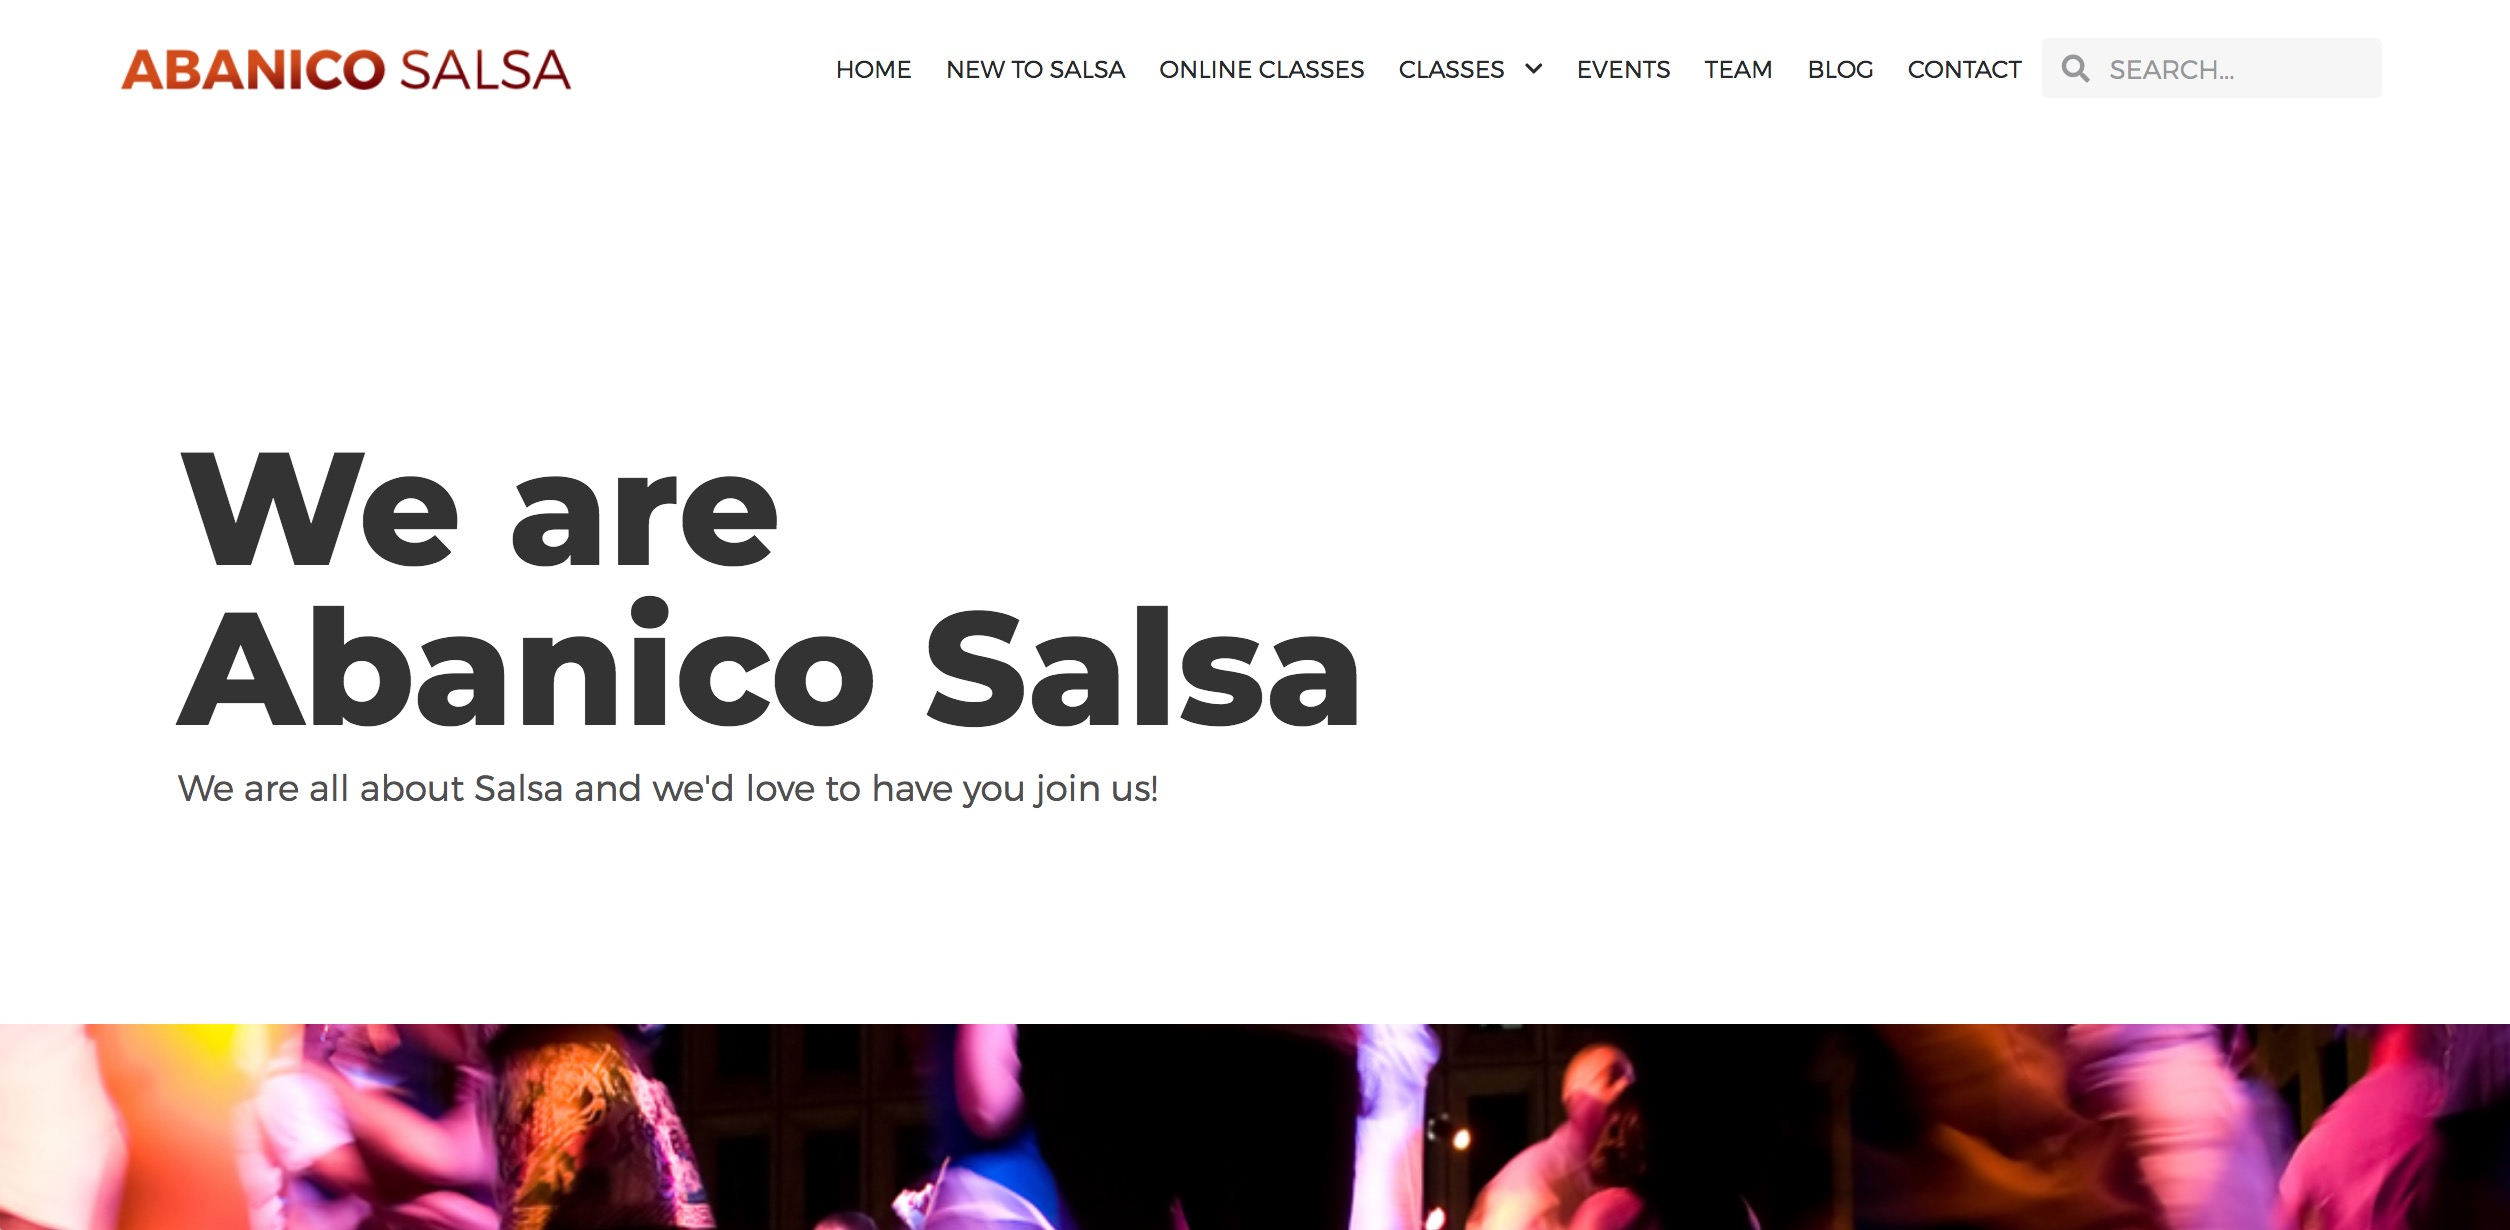 Abanico Salsa website screenshot